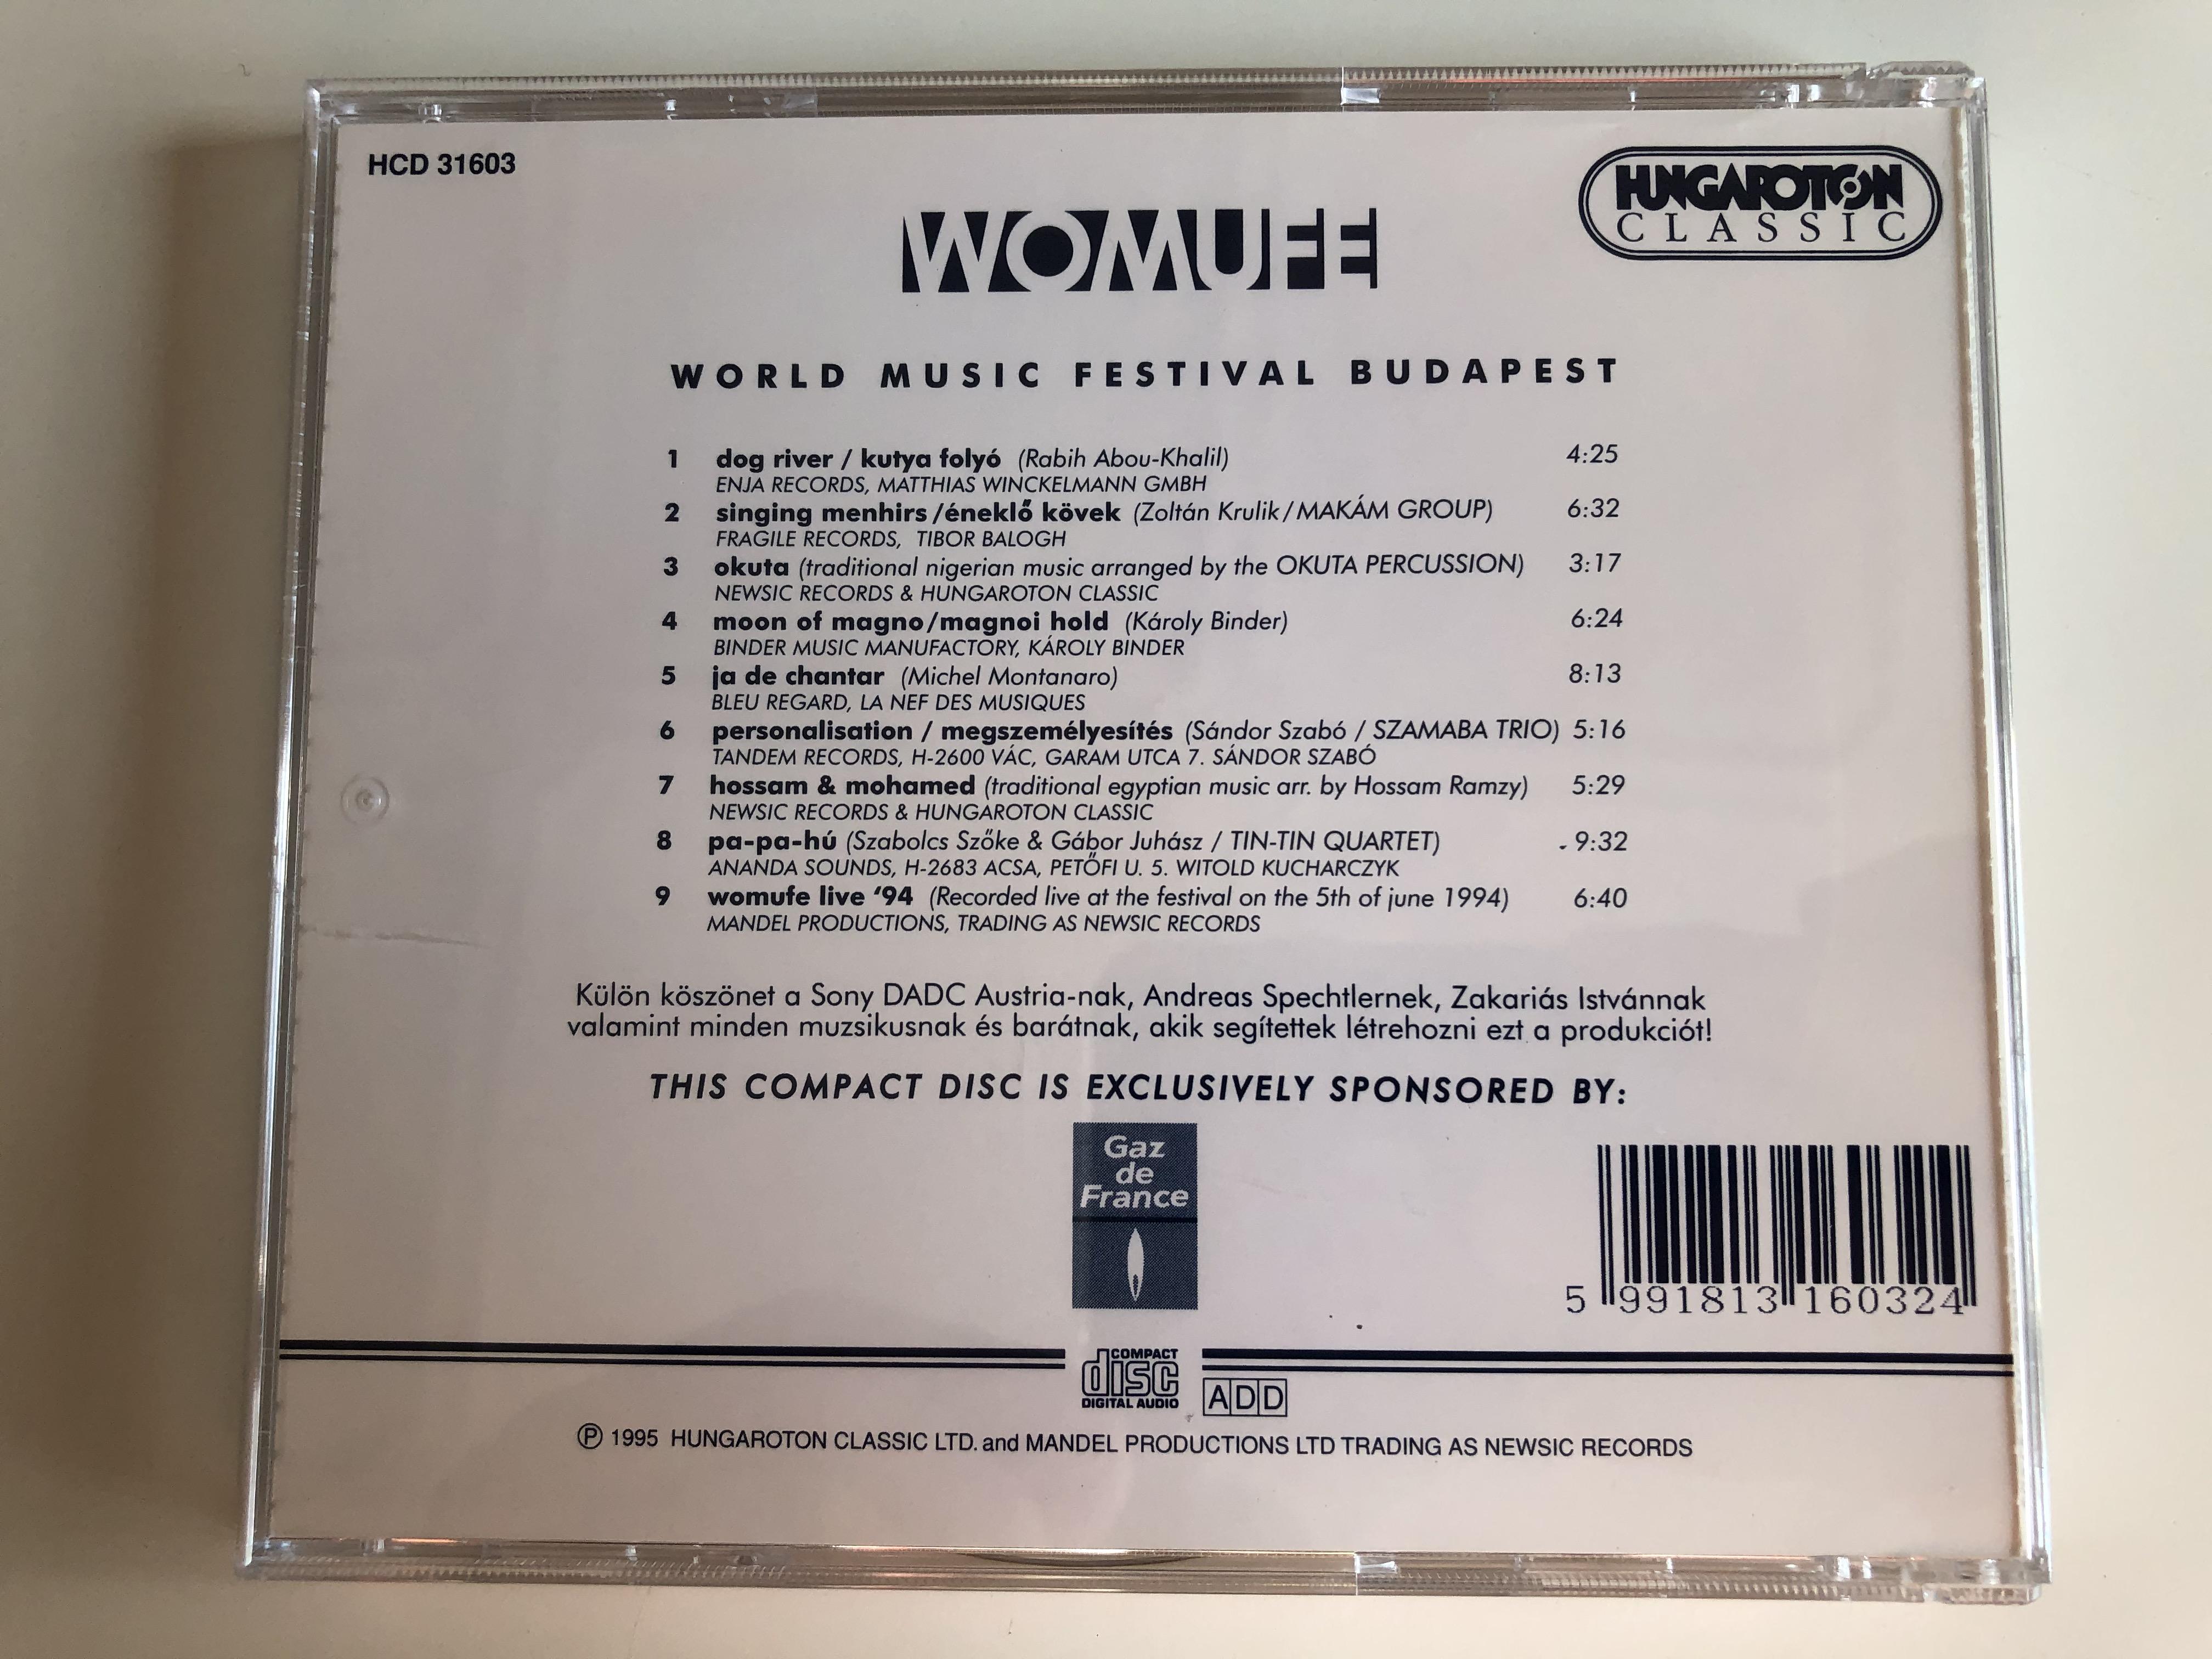 womufe-world-music-festival-budapest-produced-by-robert-mandel-hungaroton-classic-audio-cd-1995-stereo-hcd-31603-4-.jpg